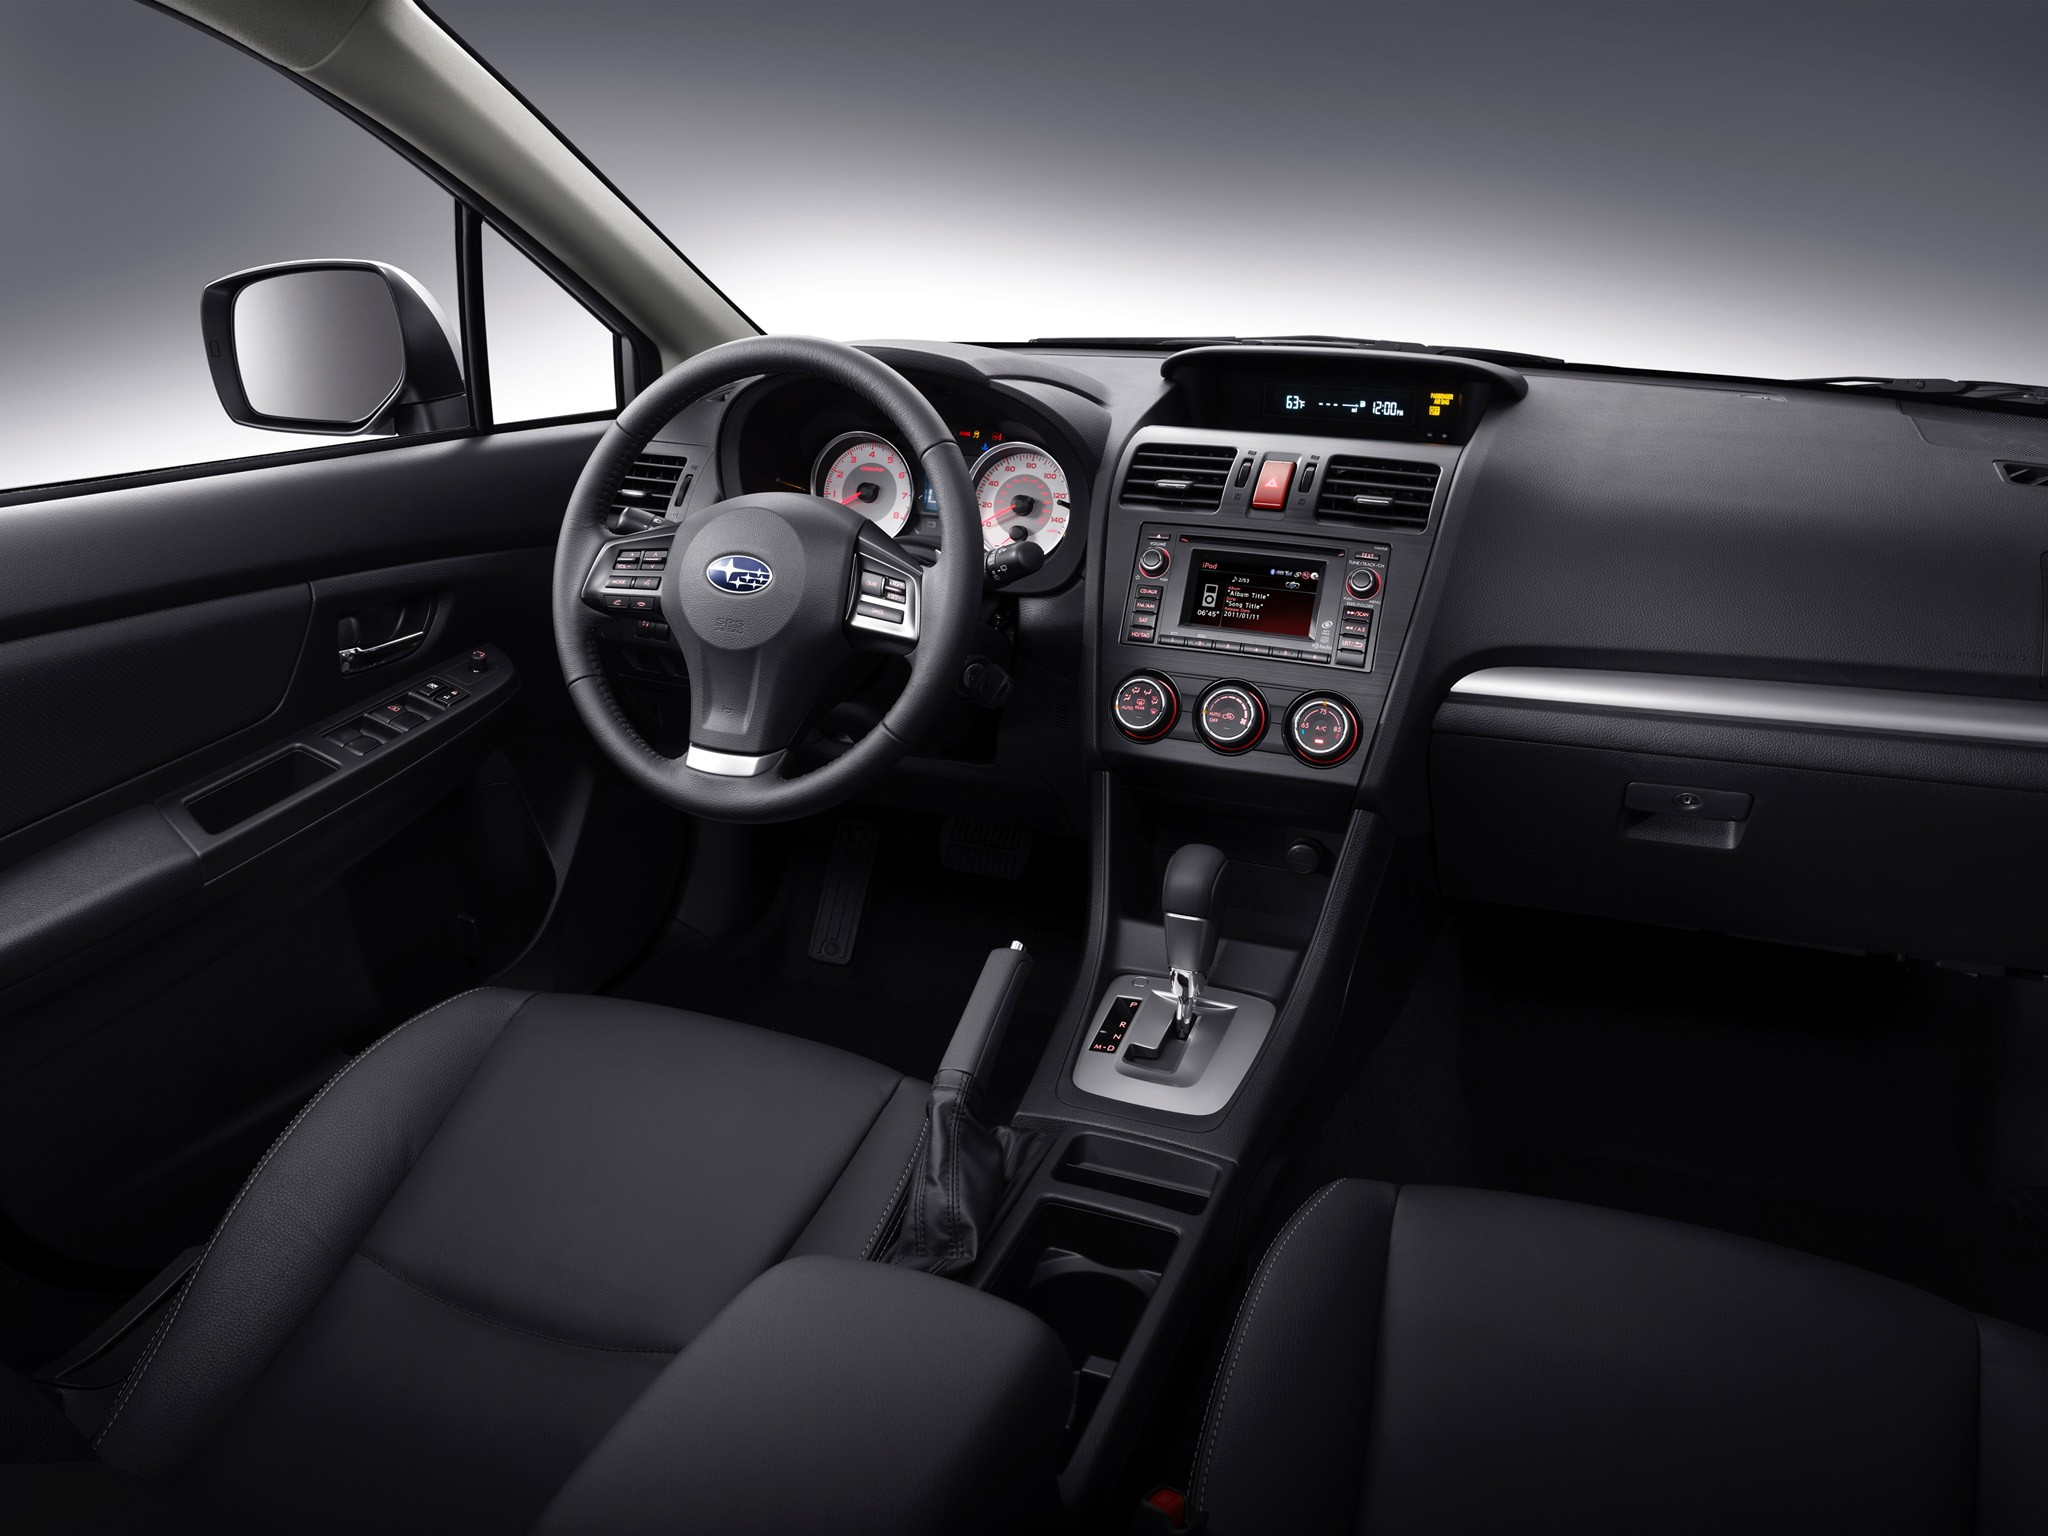 Subaru impreza 4 doors specs 2012 2013 2014 2015 2016 2017 subaru impreza 4 doors 2012 present vanachro Image collections